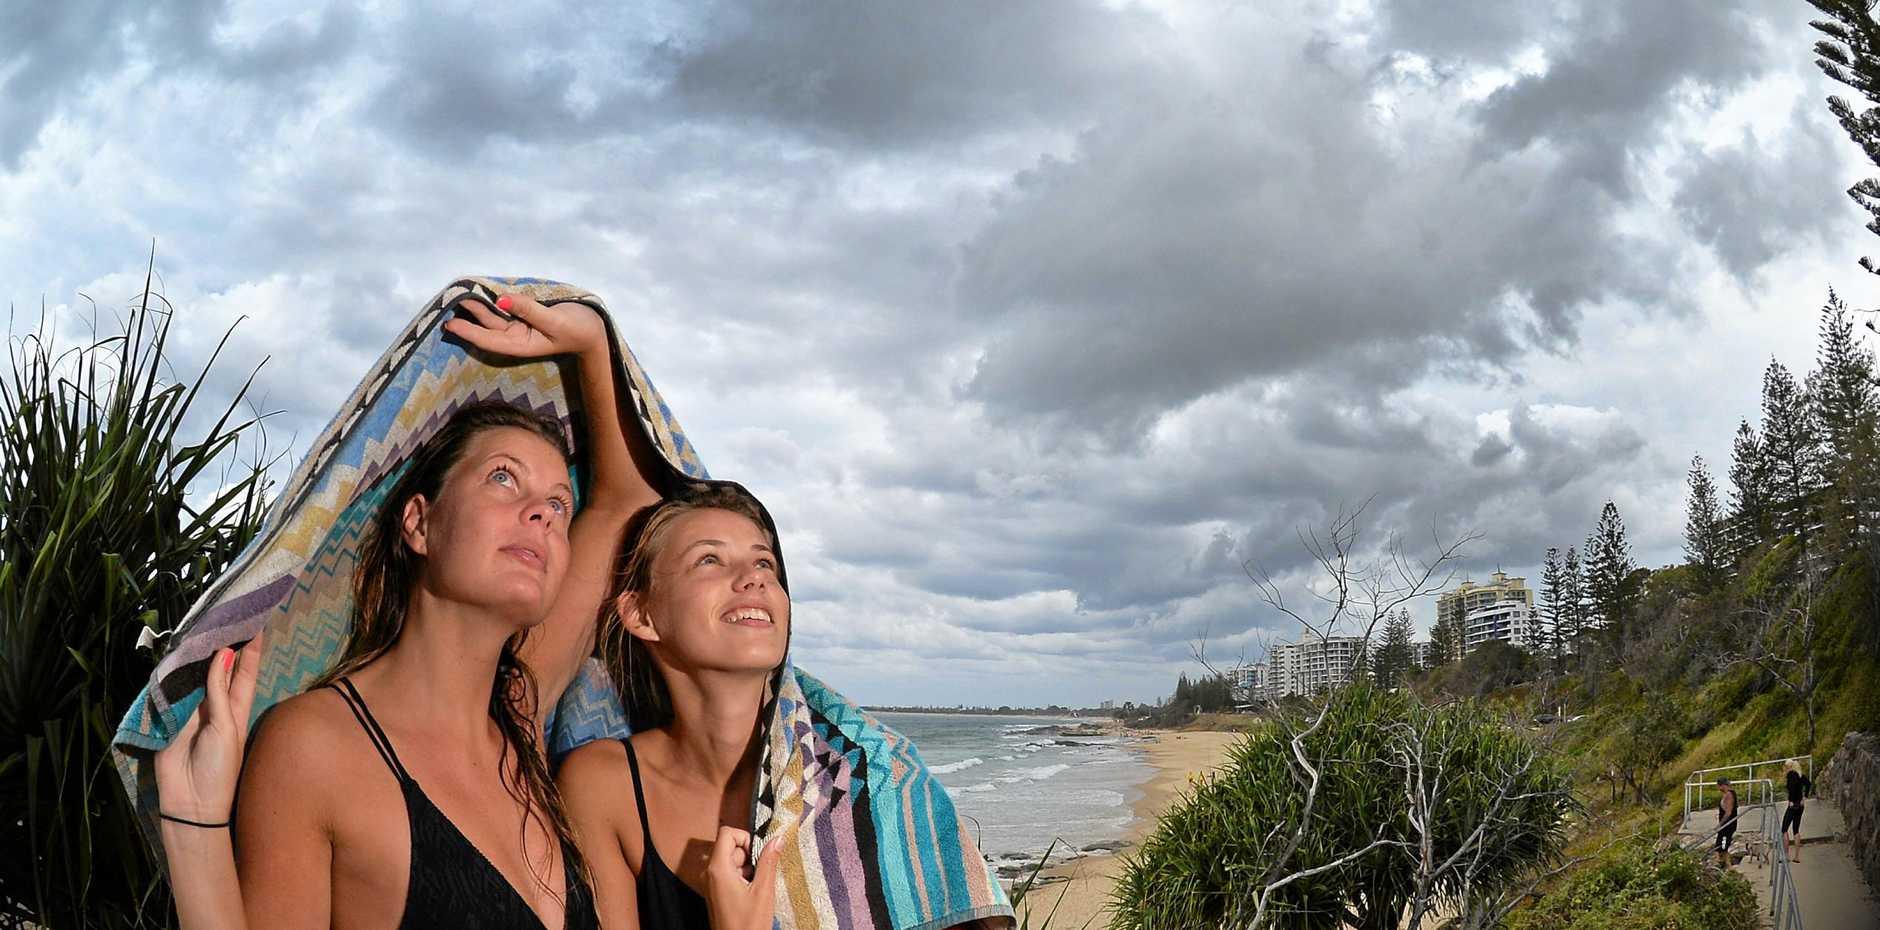 Heavy rain is expected on the Sunshine Coast.